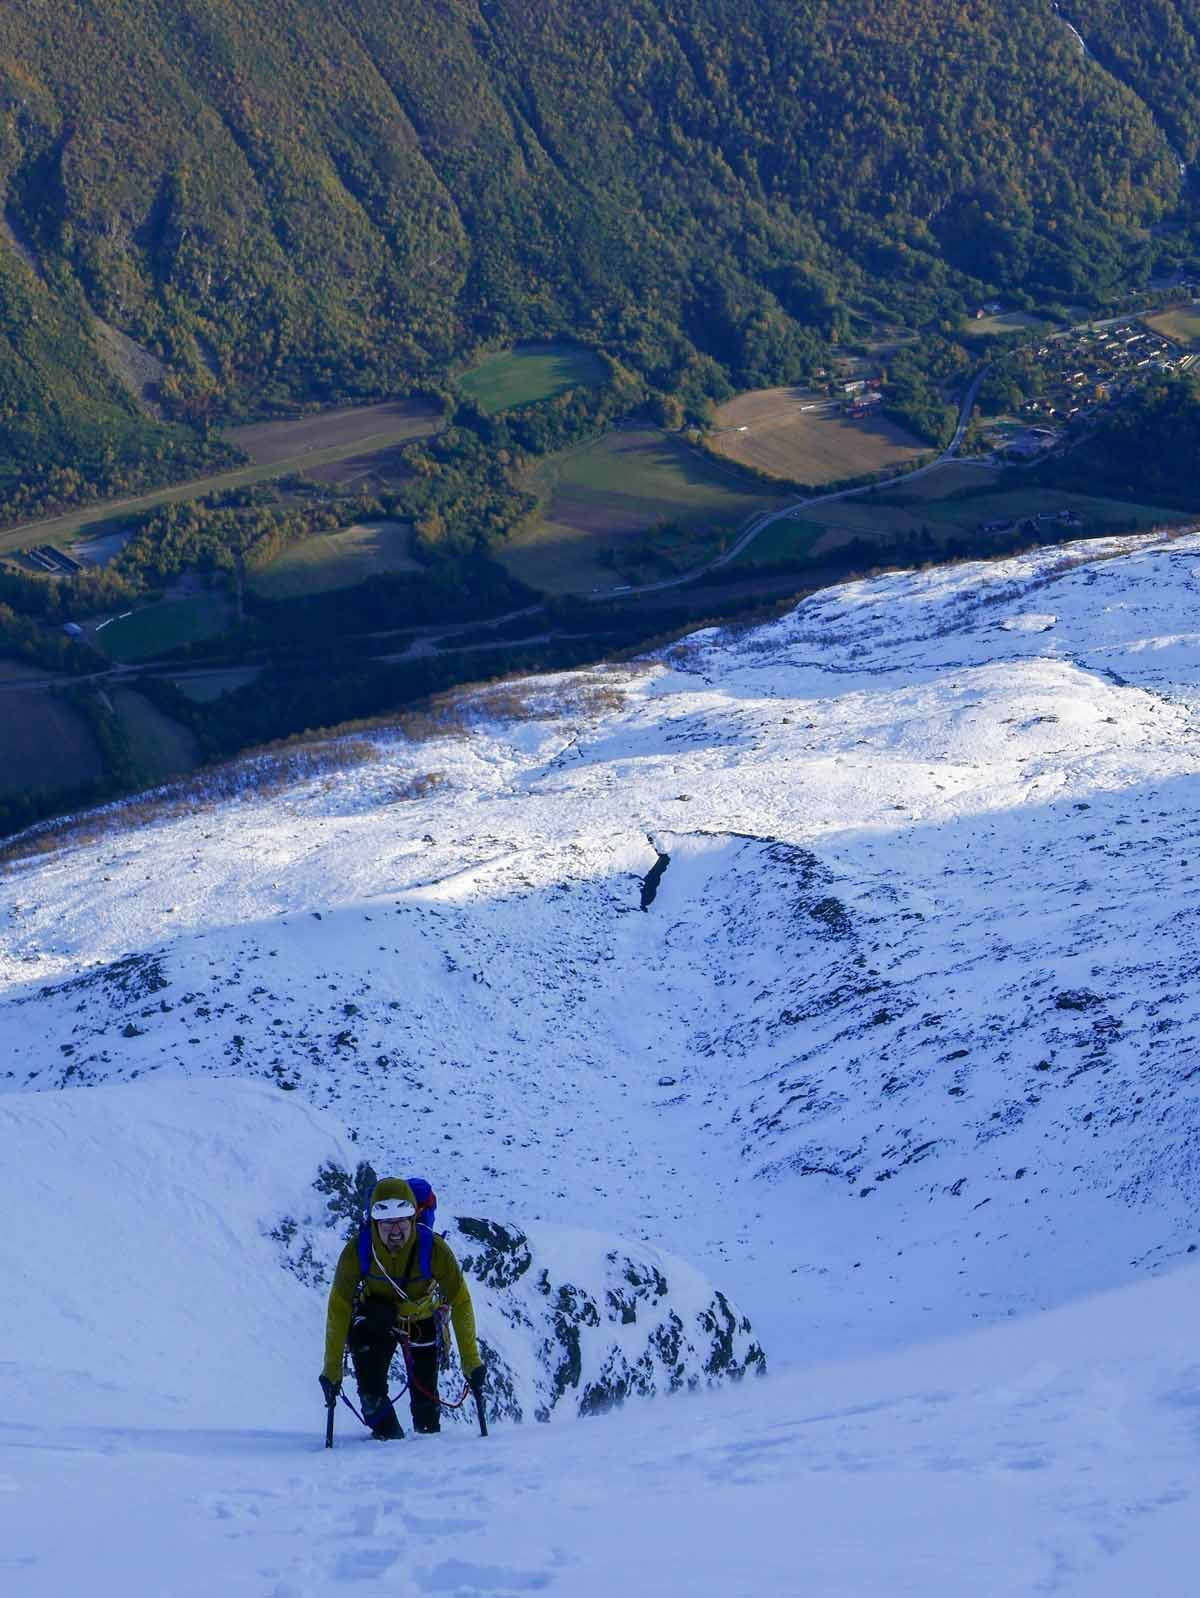 Selv om det er høst i dalen er det vinter i fjellet. Foto: Kjetil Grimsæth.